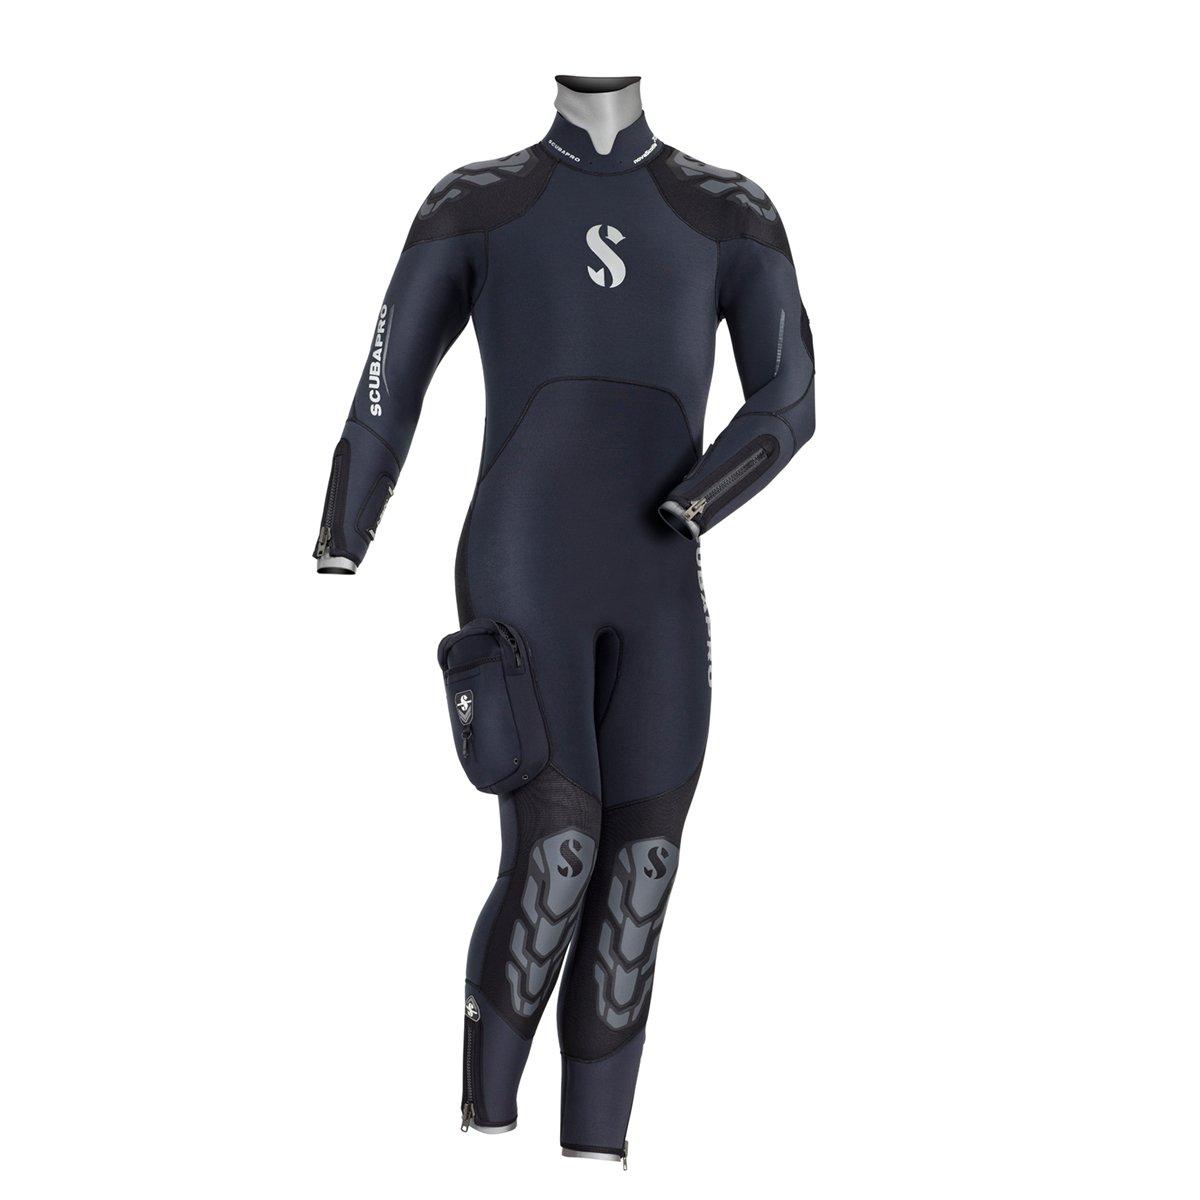 NovaScotia Steamer 7.5 mm Semi-Dry Suit